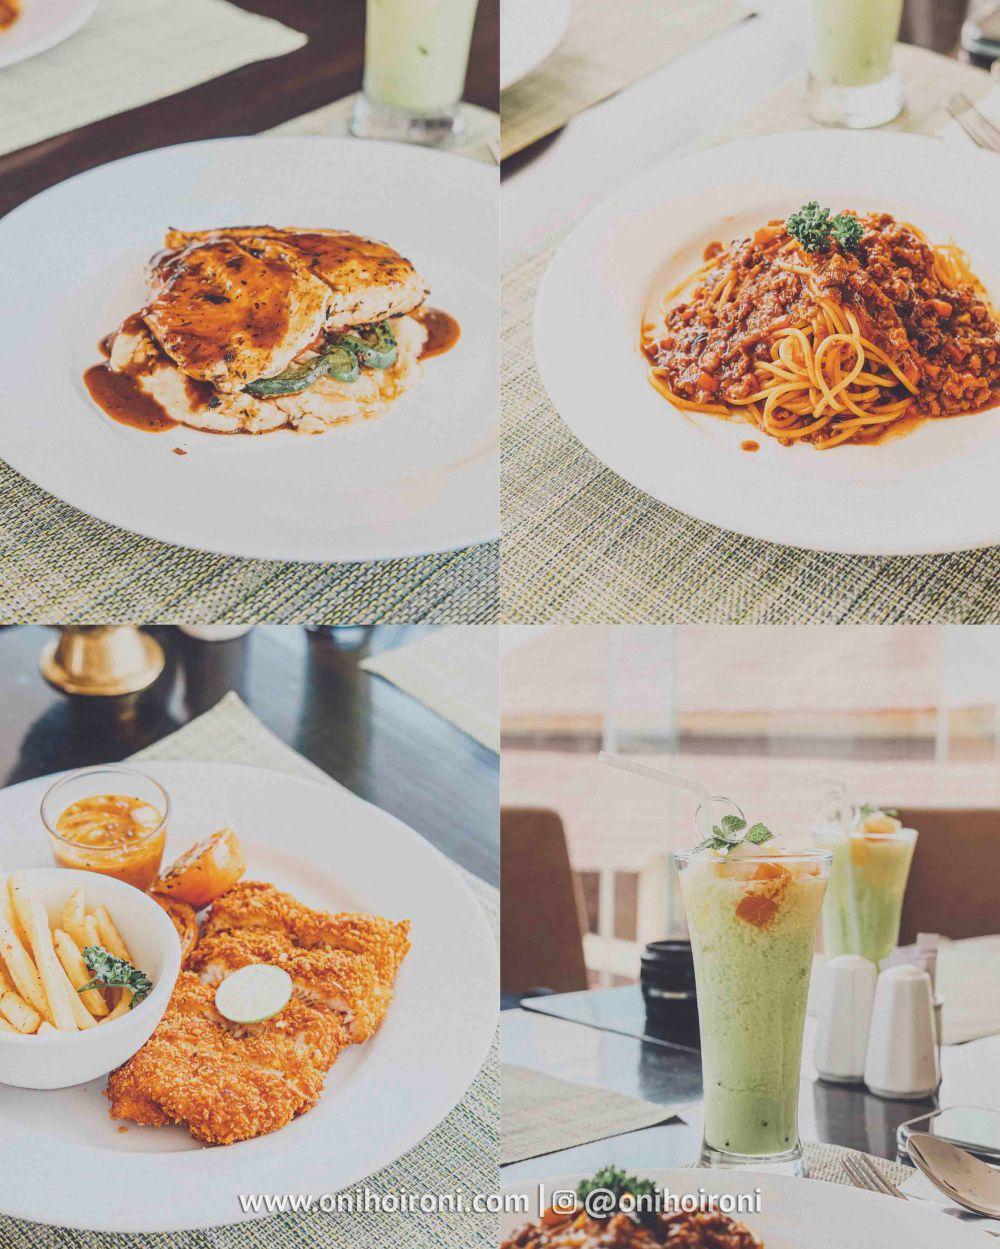 1 Makanan whiz prime hotel maliboro review oni hoironi